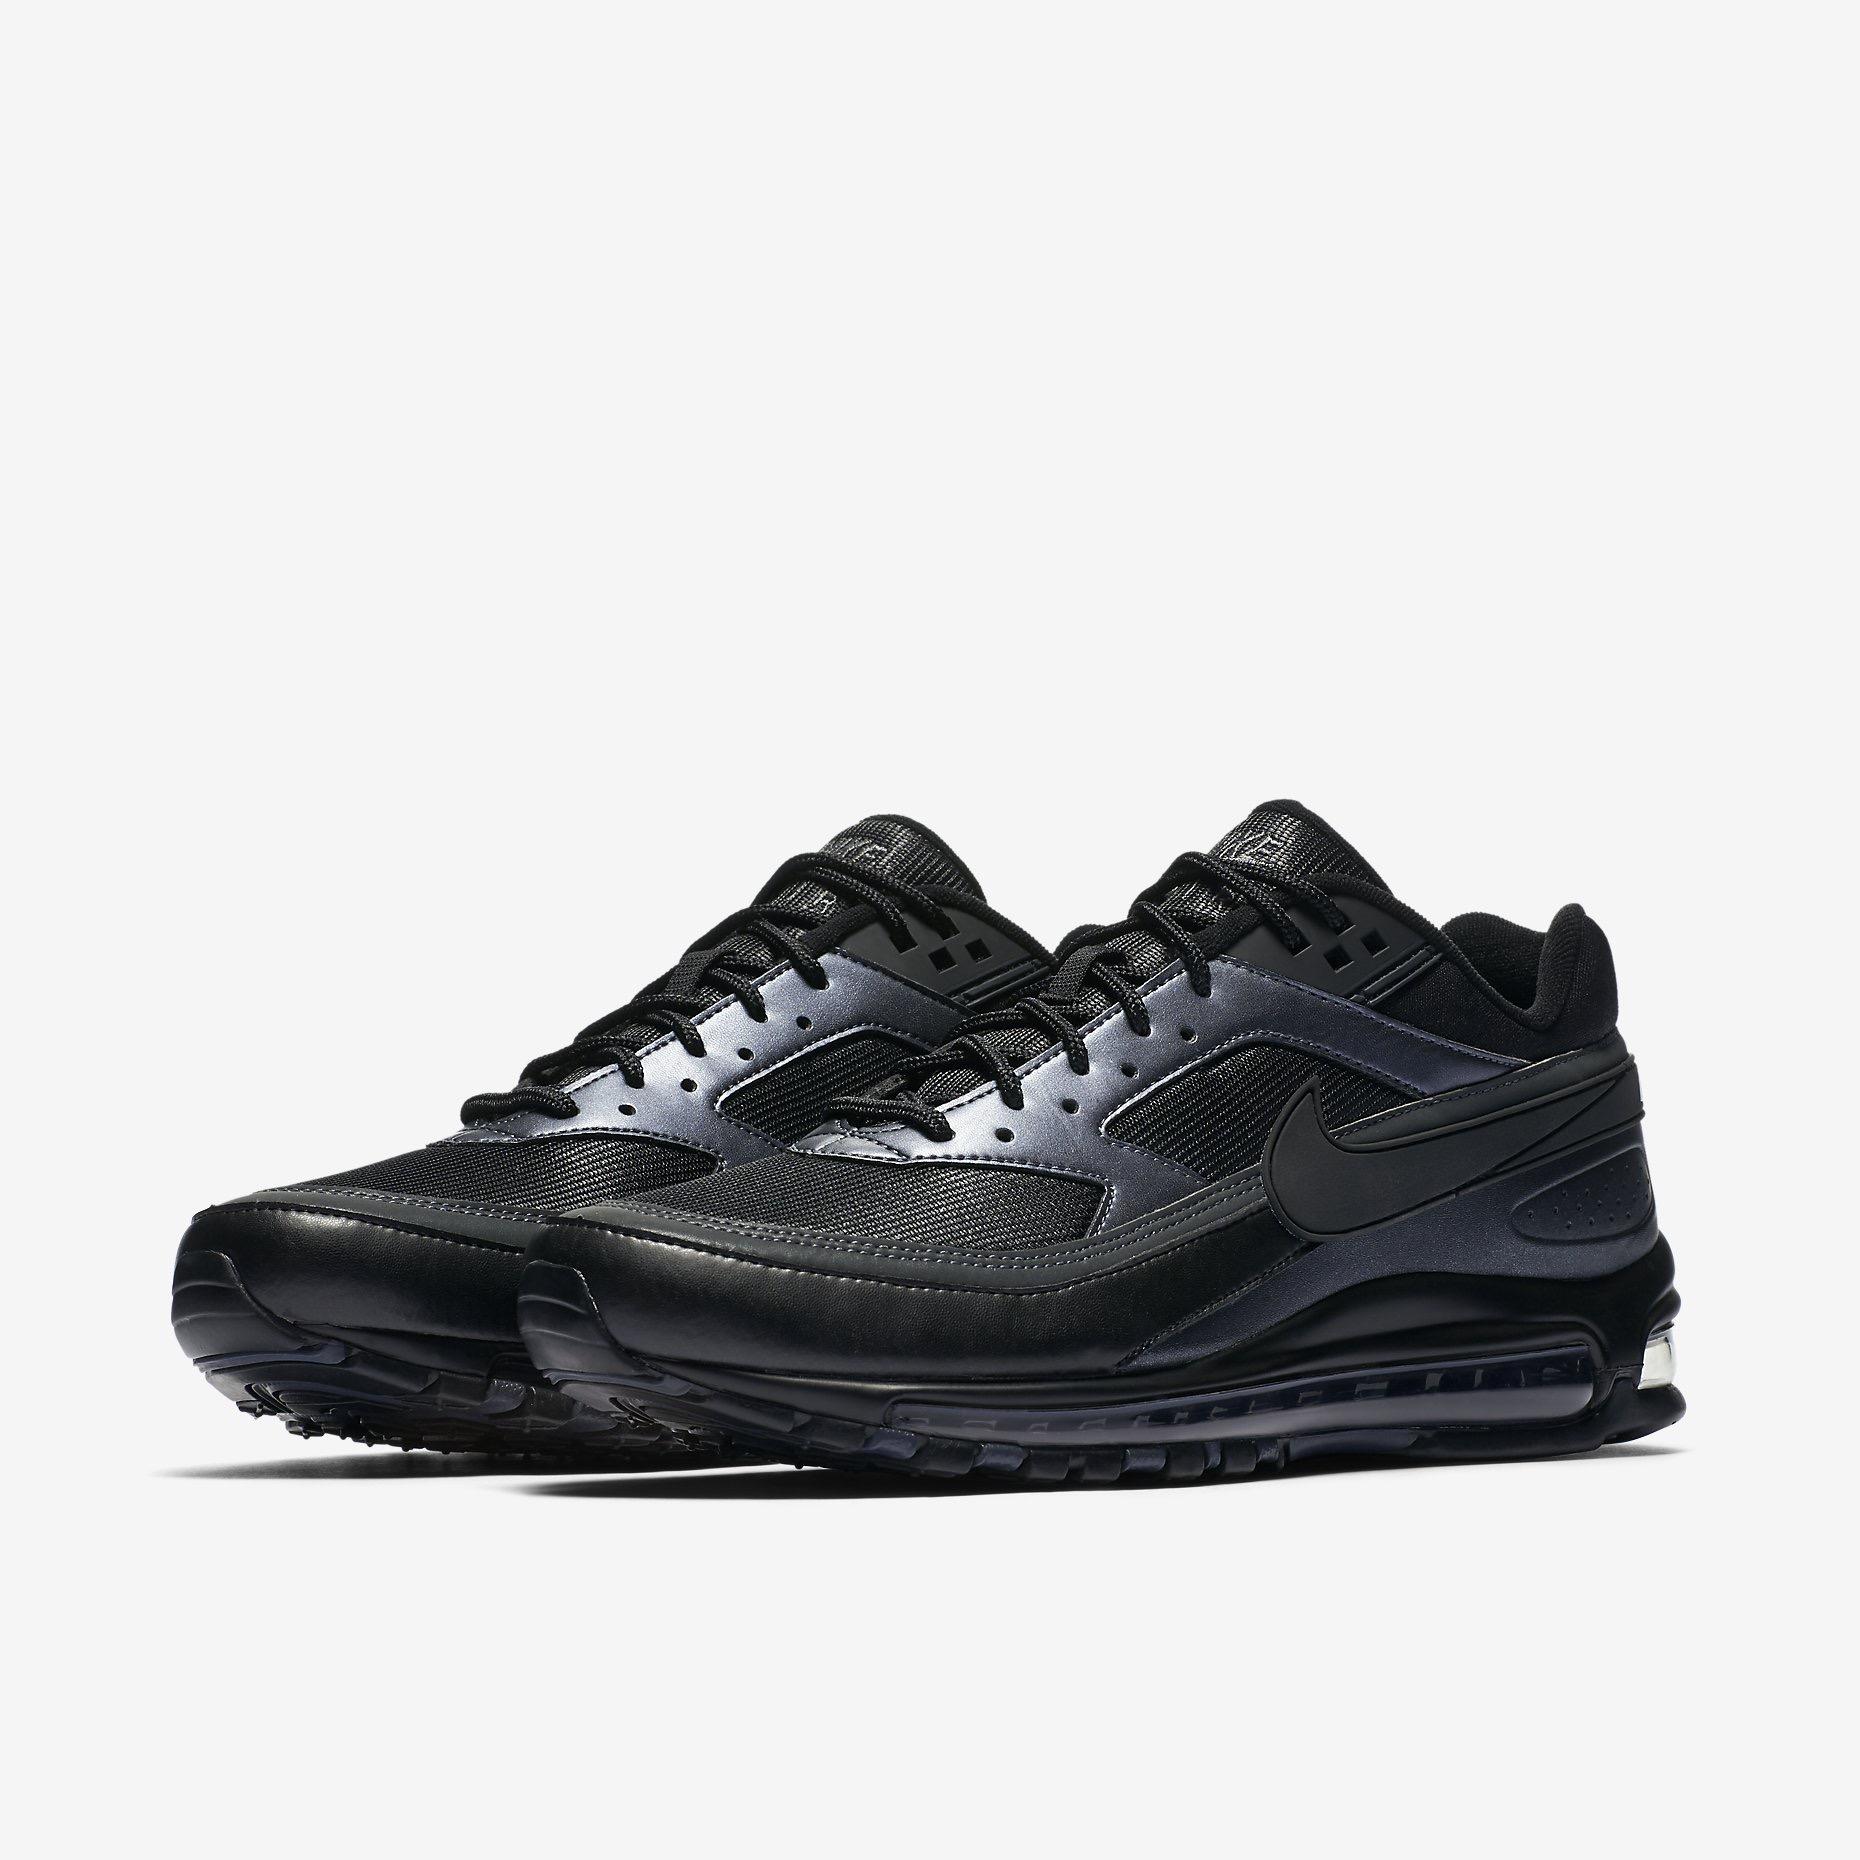 new products 1f8d5 7d1da 97 Air QS Sneakers Max Nike BW AO2406 0TP8a4qqZ